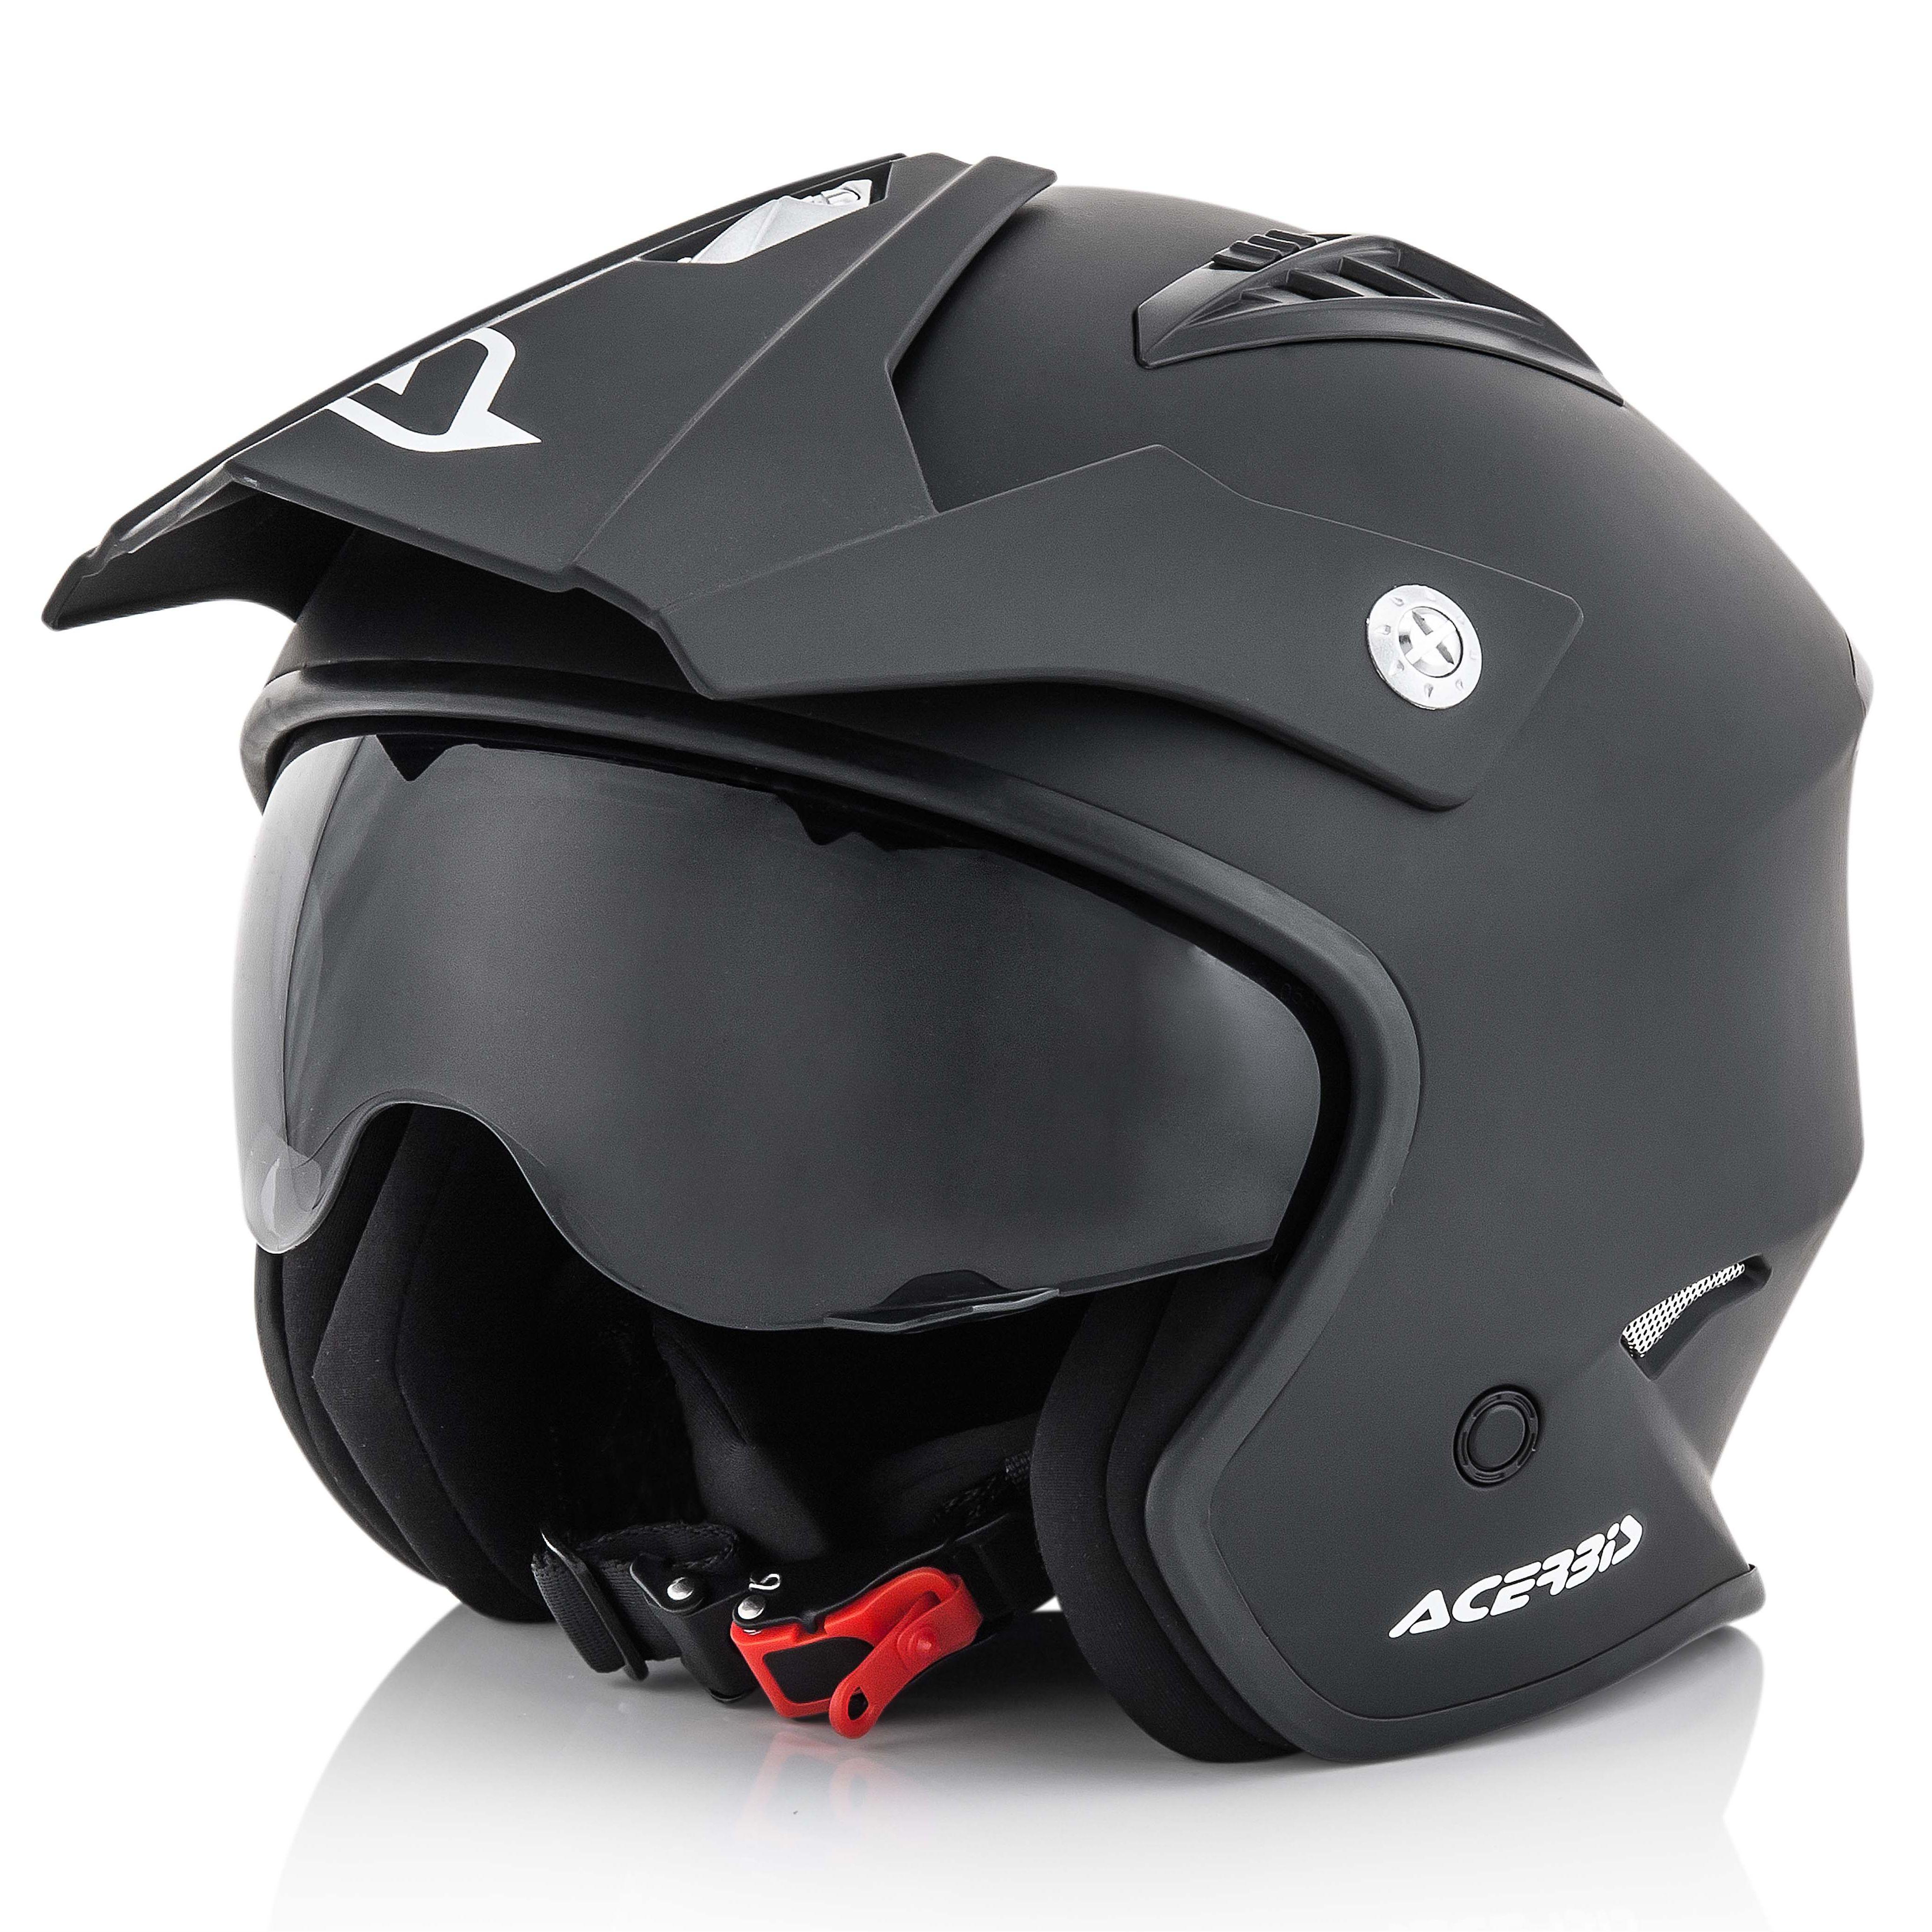 MotoMundi - Cascos Integrales Scorpion EXO-R2000 Fortis Helmet